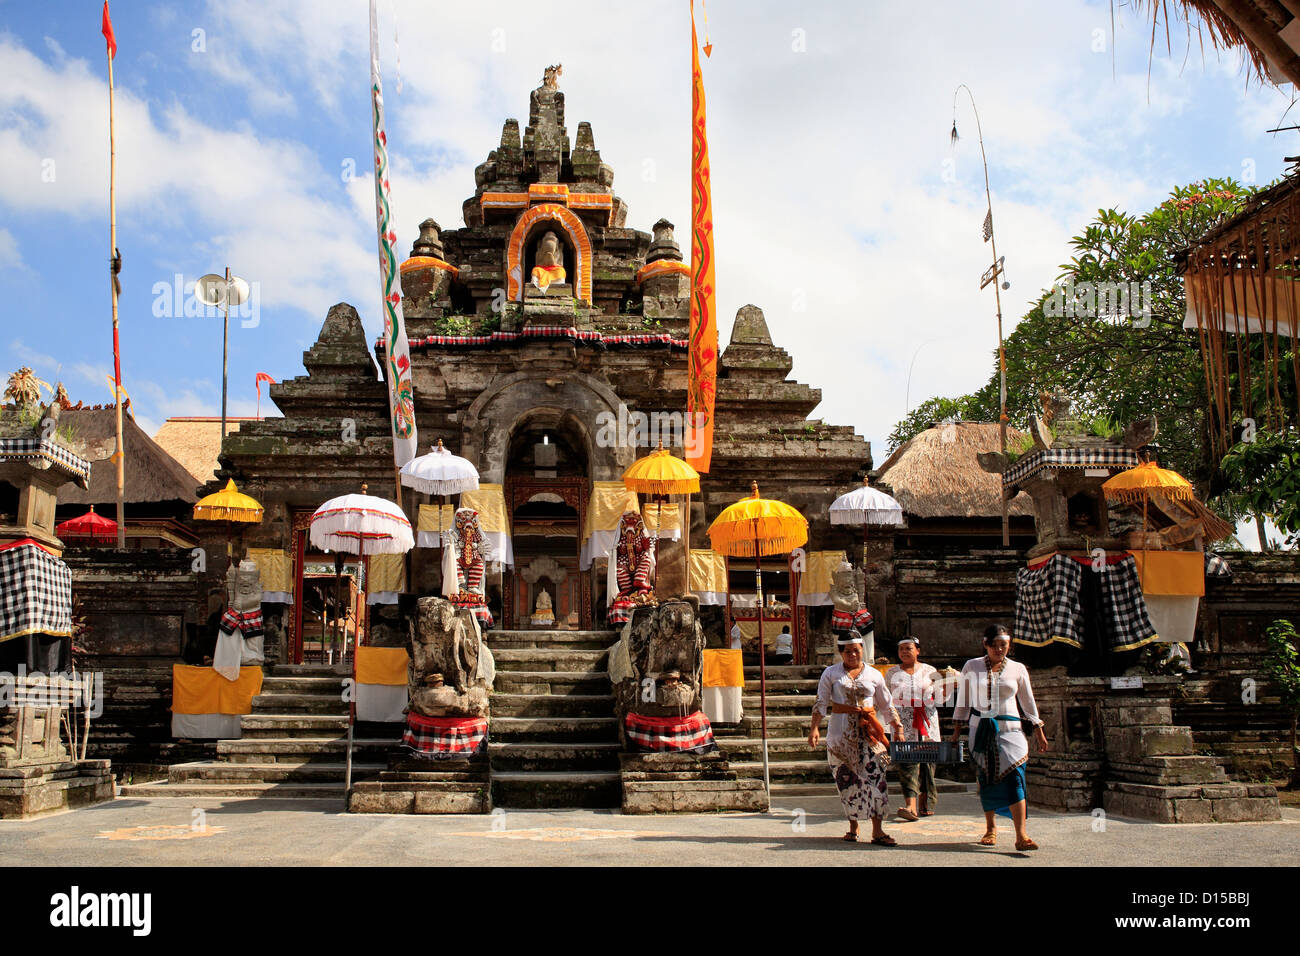 The main entrance to Pura Dalem Tengaling Temple at Pejeng. Near Ubud, Bali, Indonesia - Stock Image